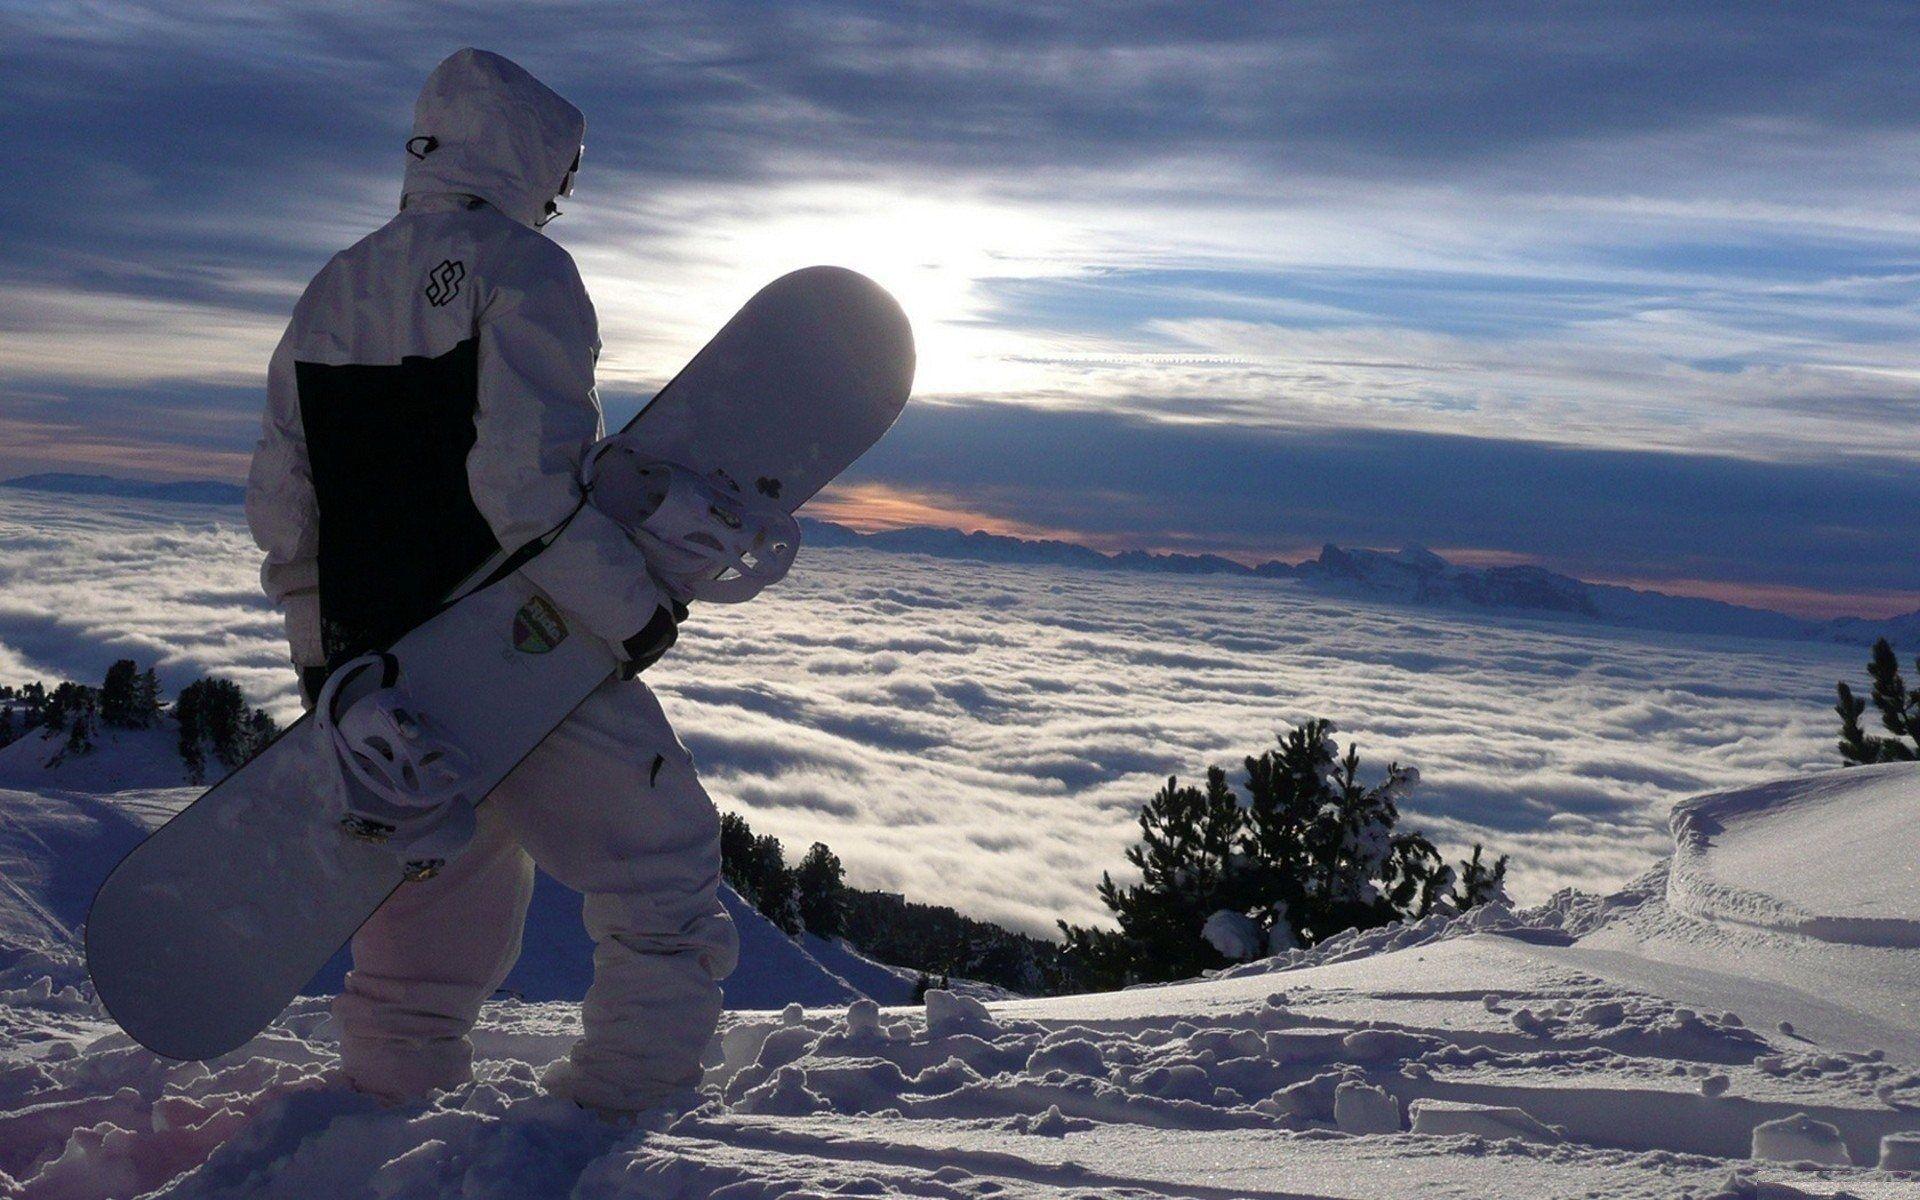 Snowboarding Wallpaper Hd Widescreen Lugares Para